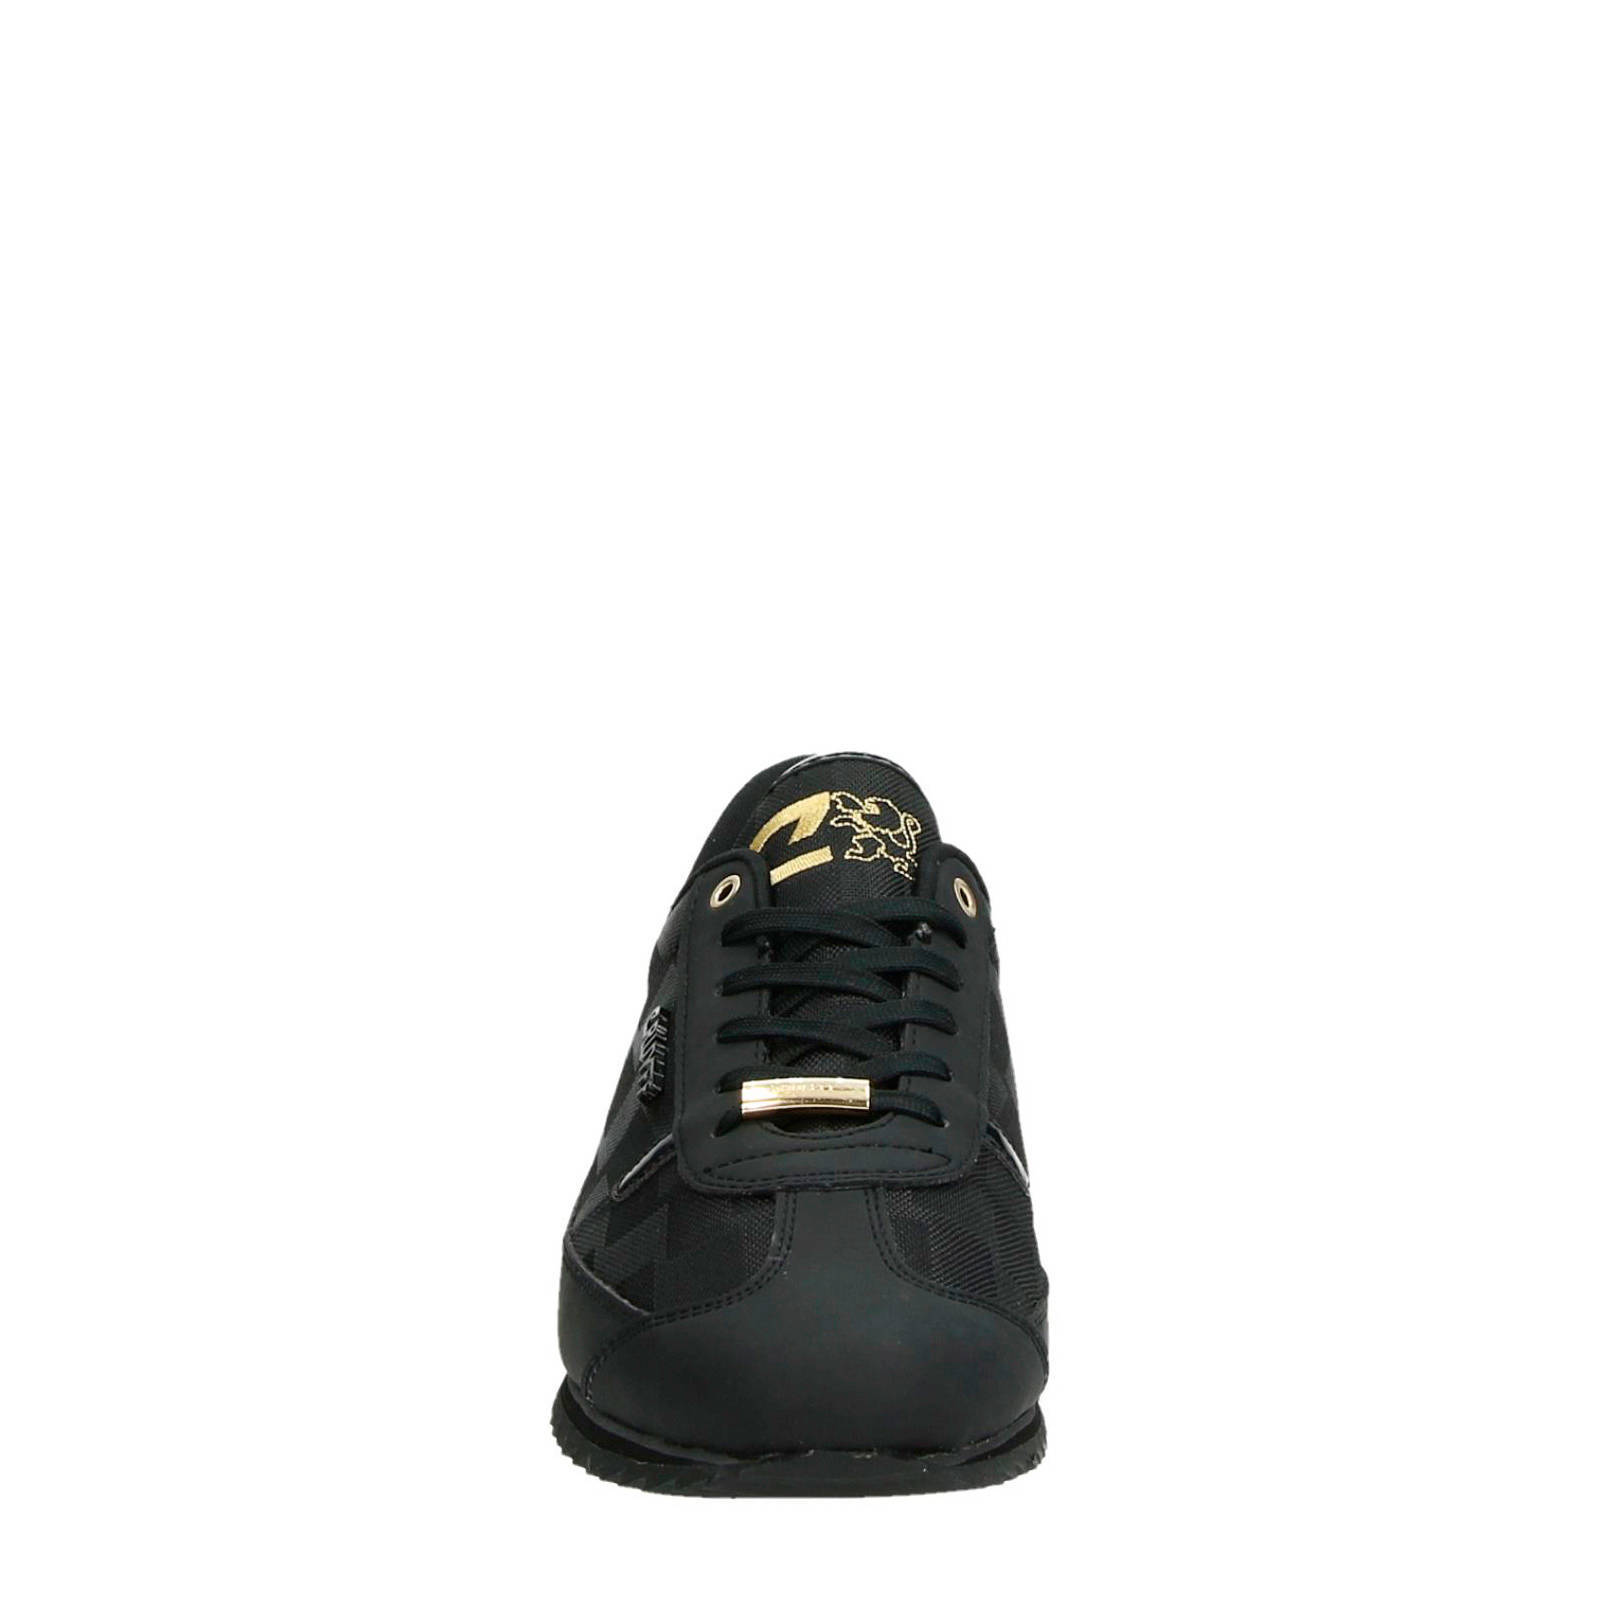 b0db4ec3bde Cruyff Montanya sneakers zwart | wehkamp